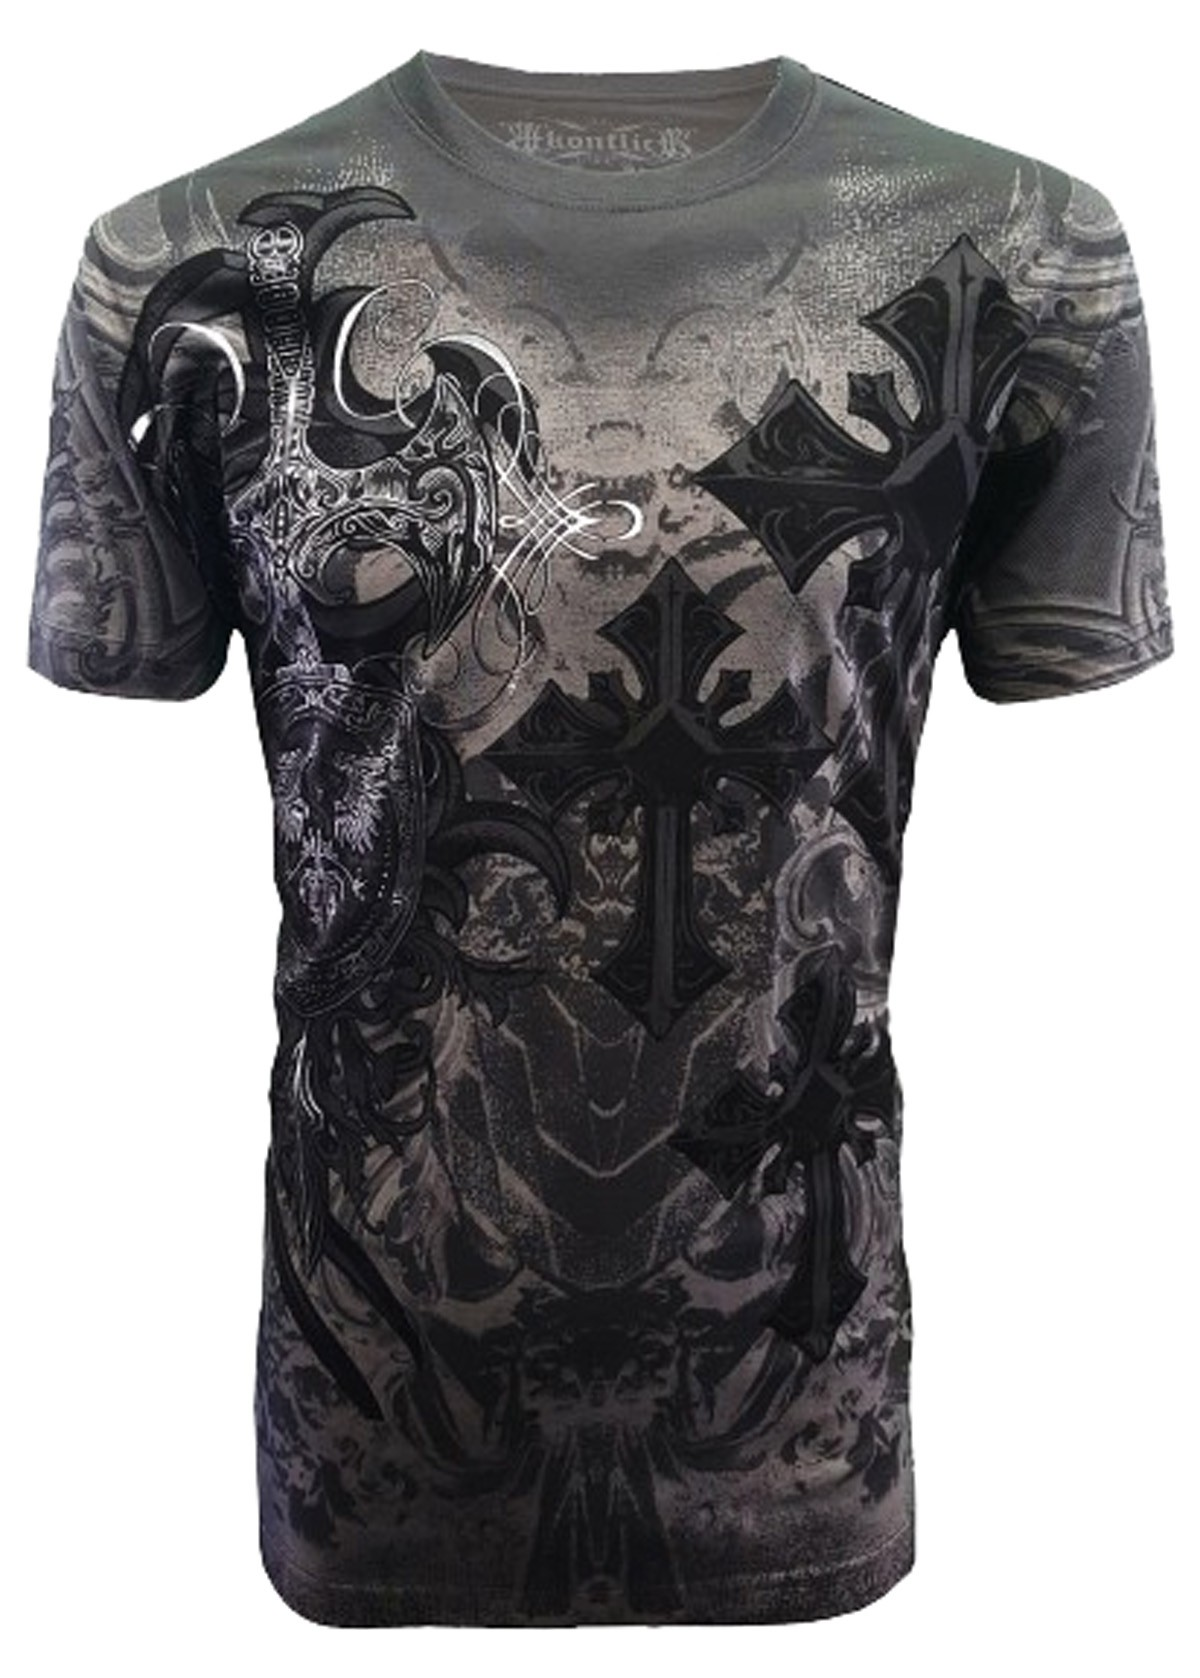 Konflic Clothing - God Bless T-Shirt